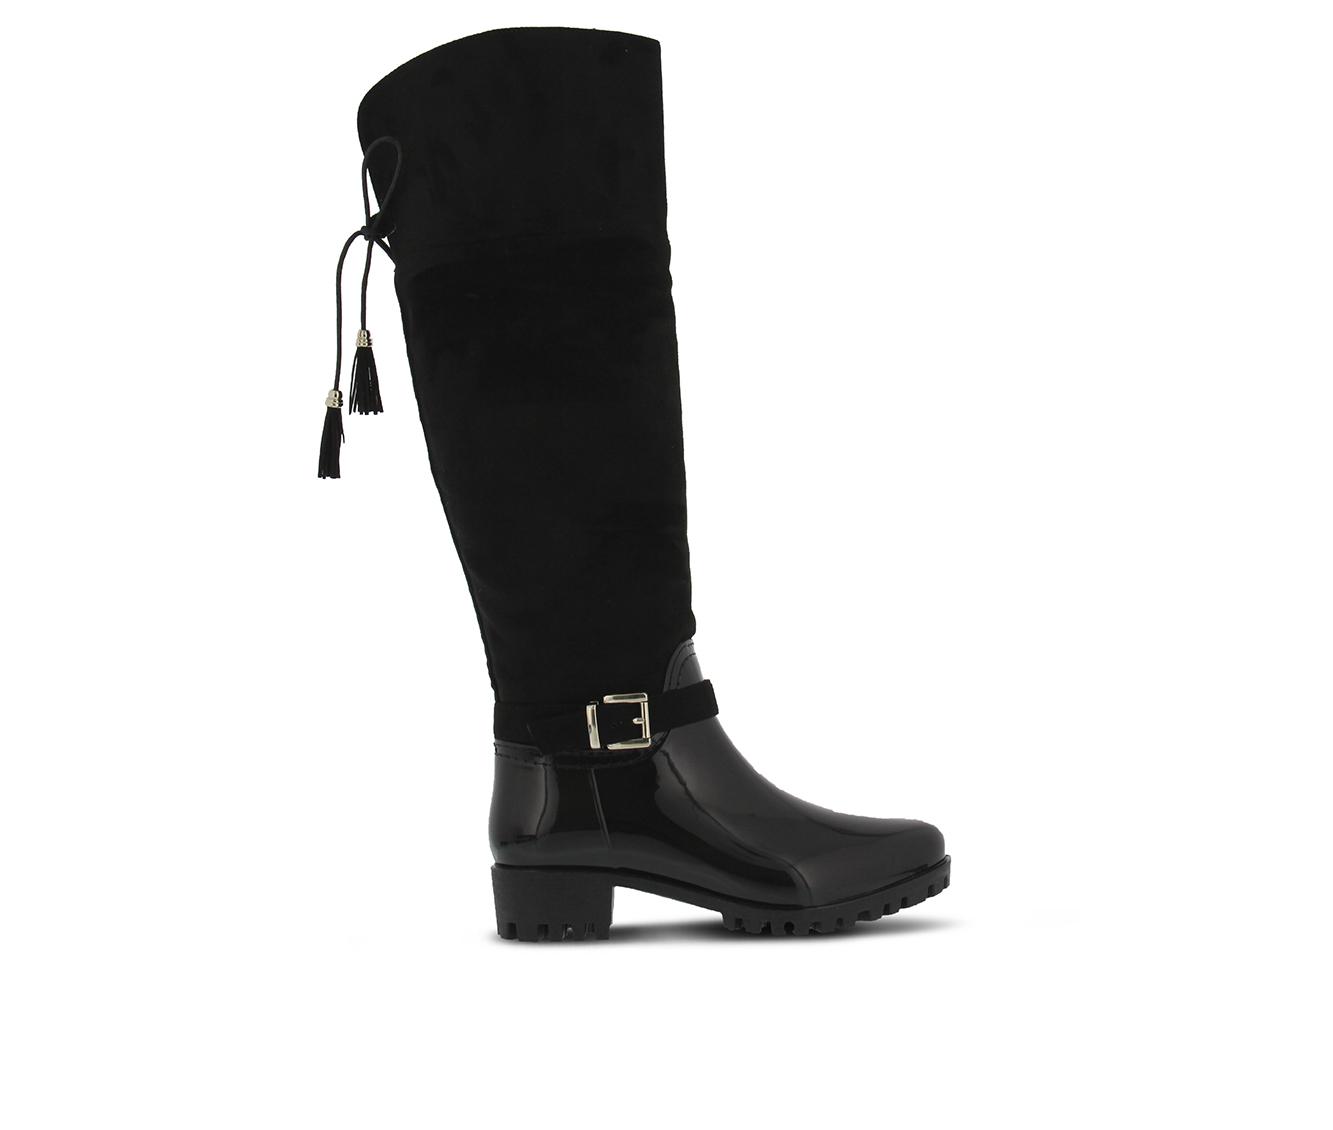 SPRING STEP Mattie Women's Boots (Black Faux Leather)